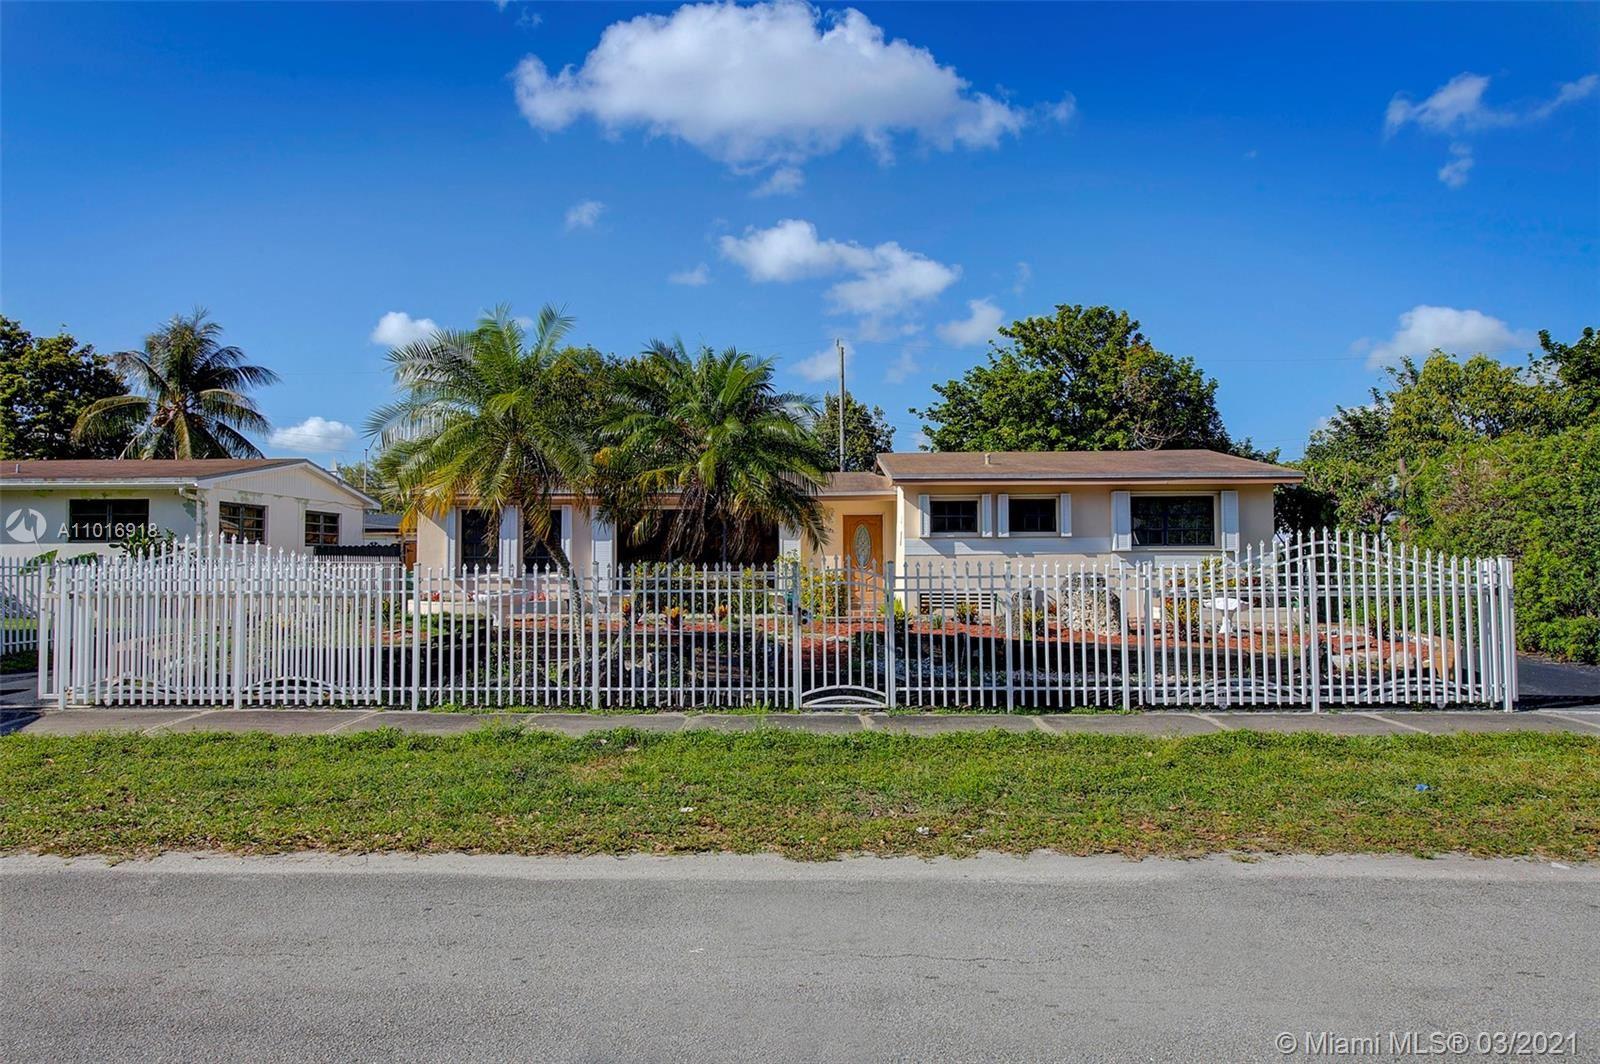 1145 NW 185th Ter, Miami Gardens, FL 33169 - #: A11016918